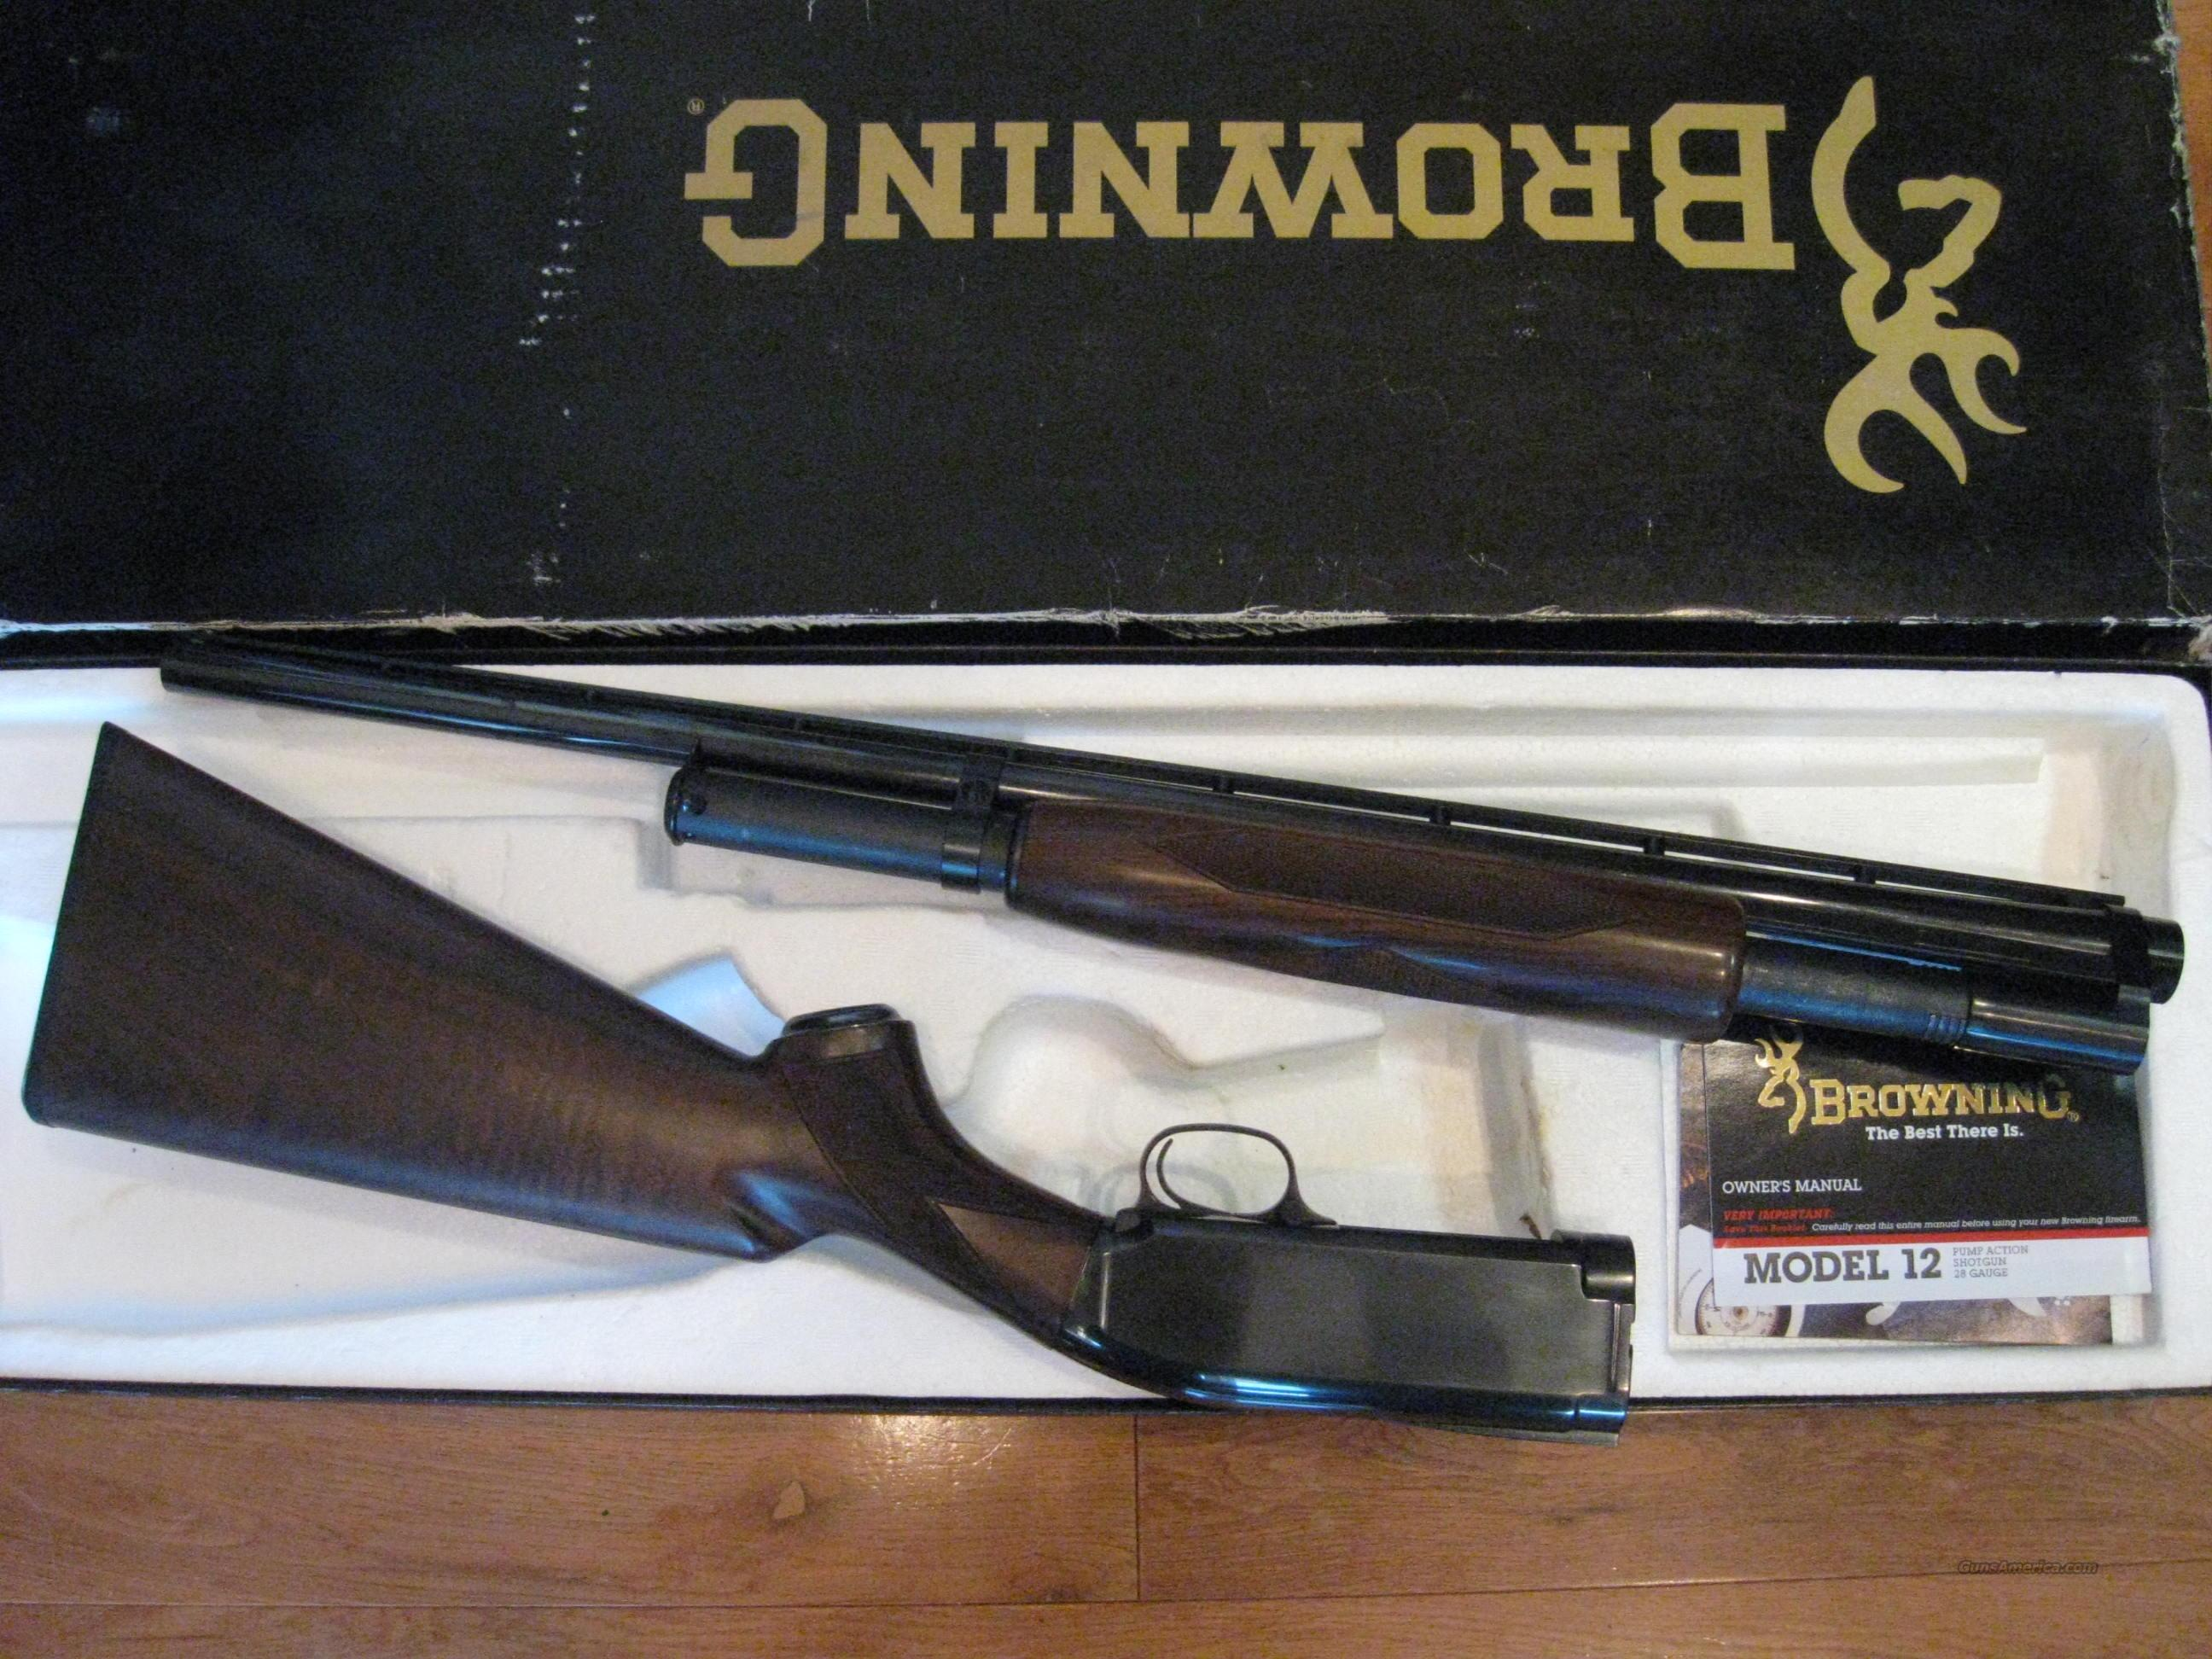 Browning M-12 28ga NIB  Guns > Shotguns > Browning Shotguns > Pump Action > Hunting